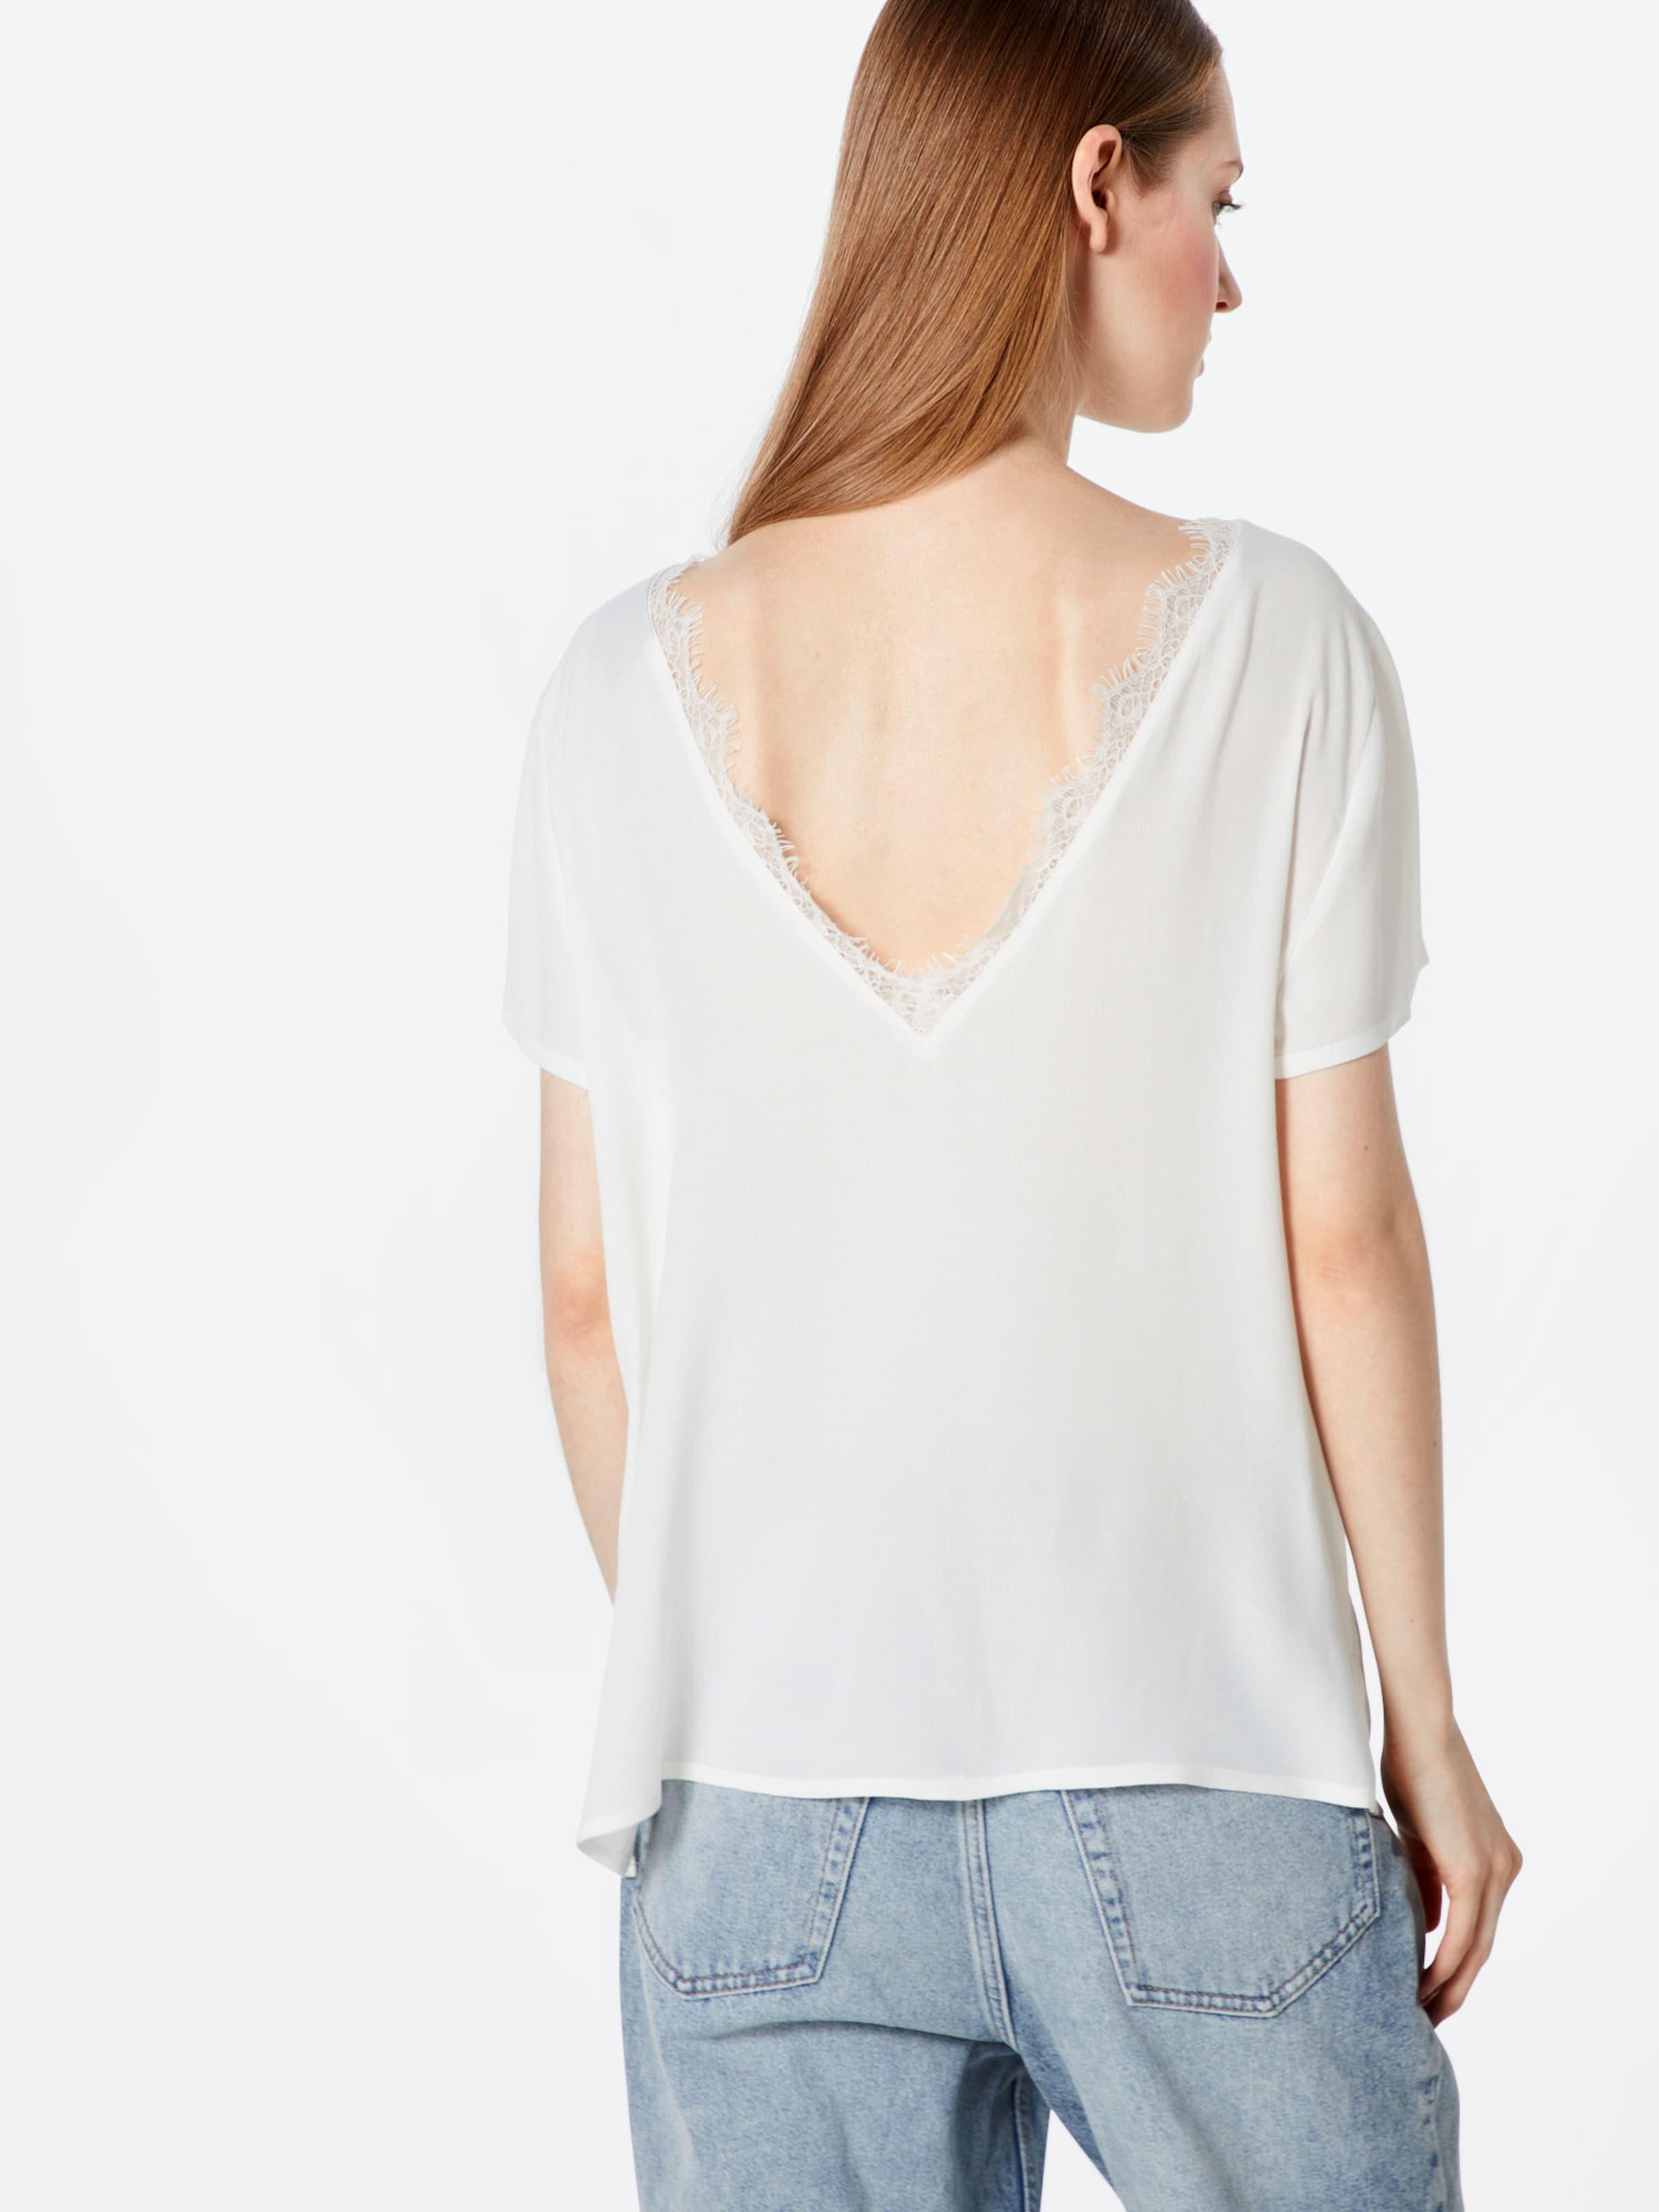 T shirt Object 'lourdes' In Weiß v8Nmnw0O